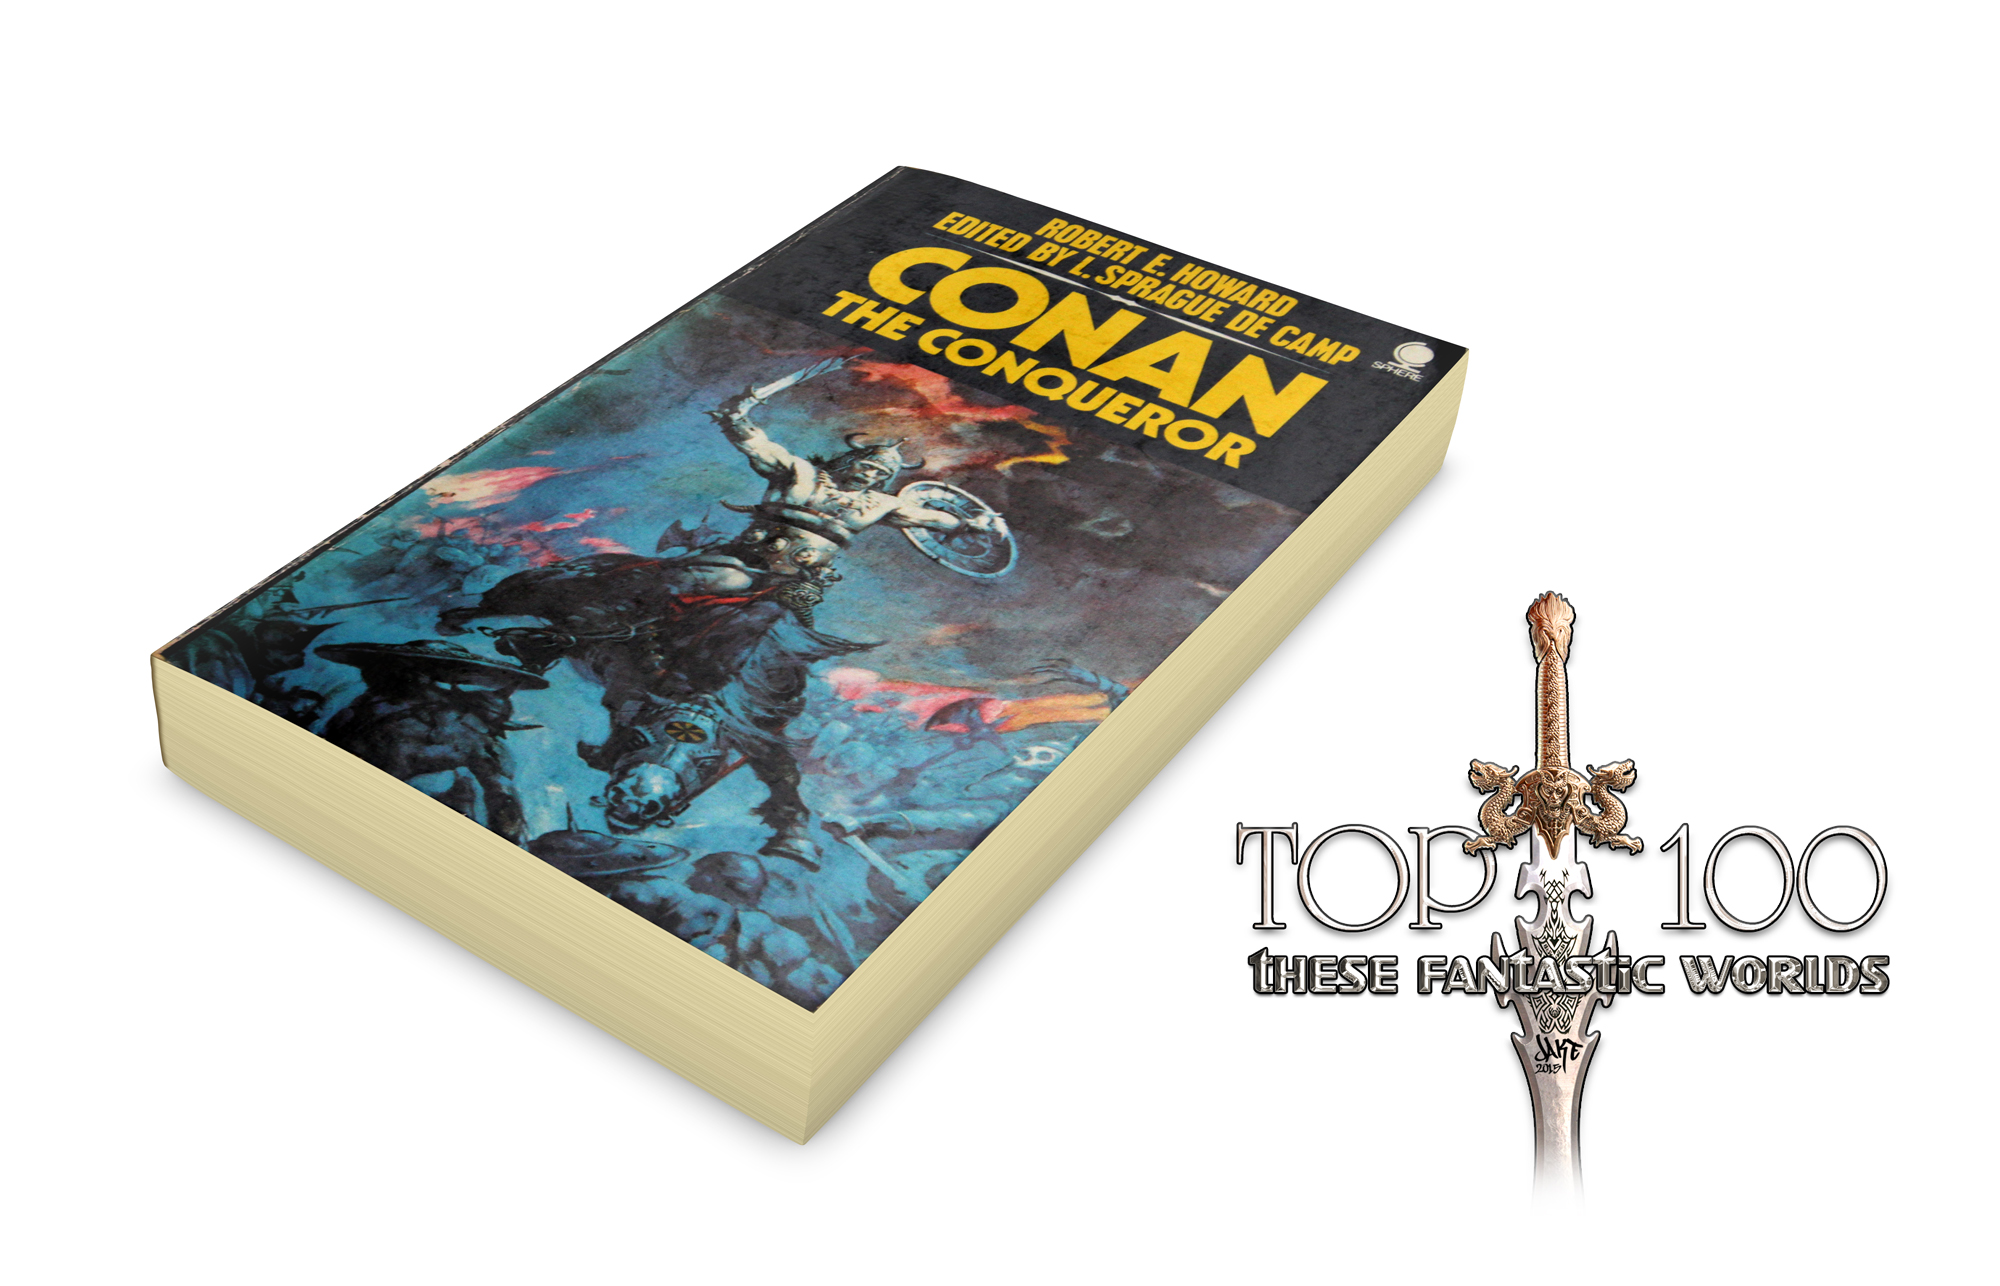 Top 100 Sf and Fantasy. Conan. Robert E Howard, These Fantastic Worlds